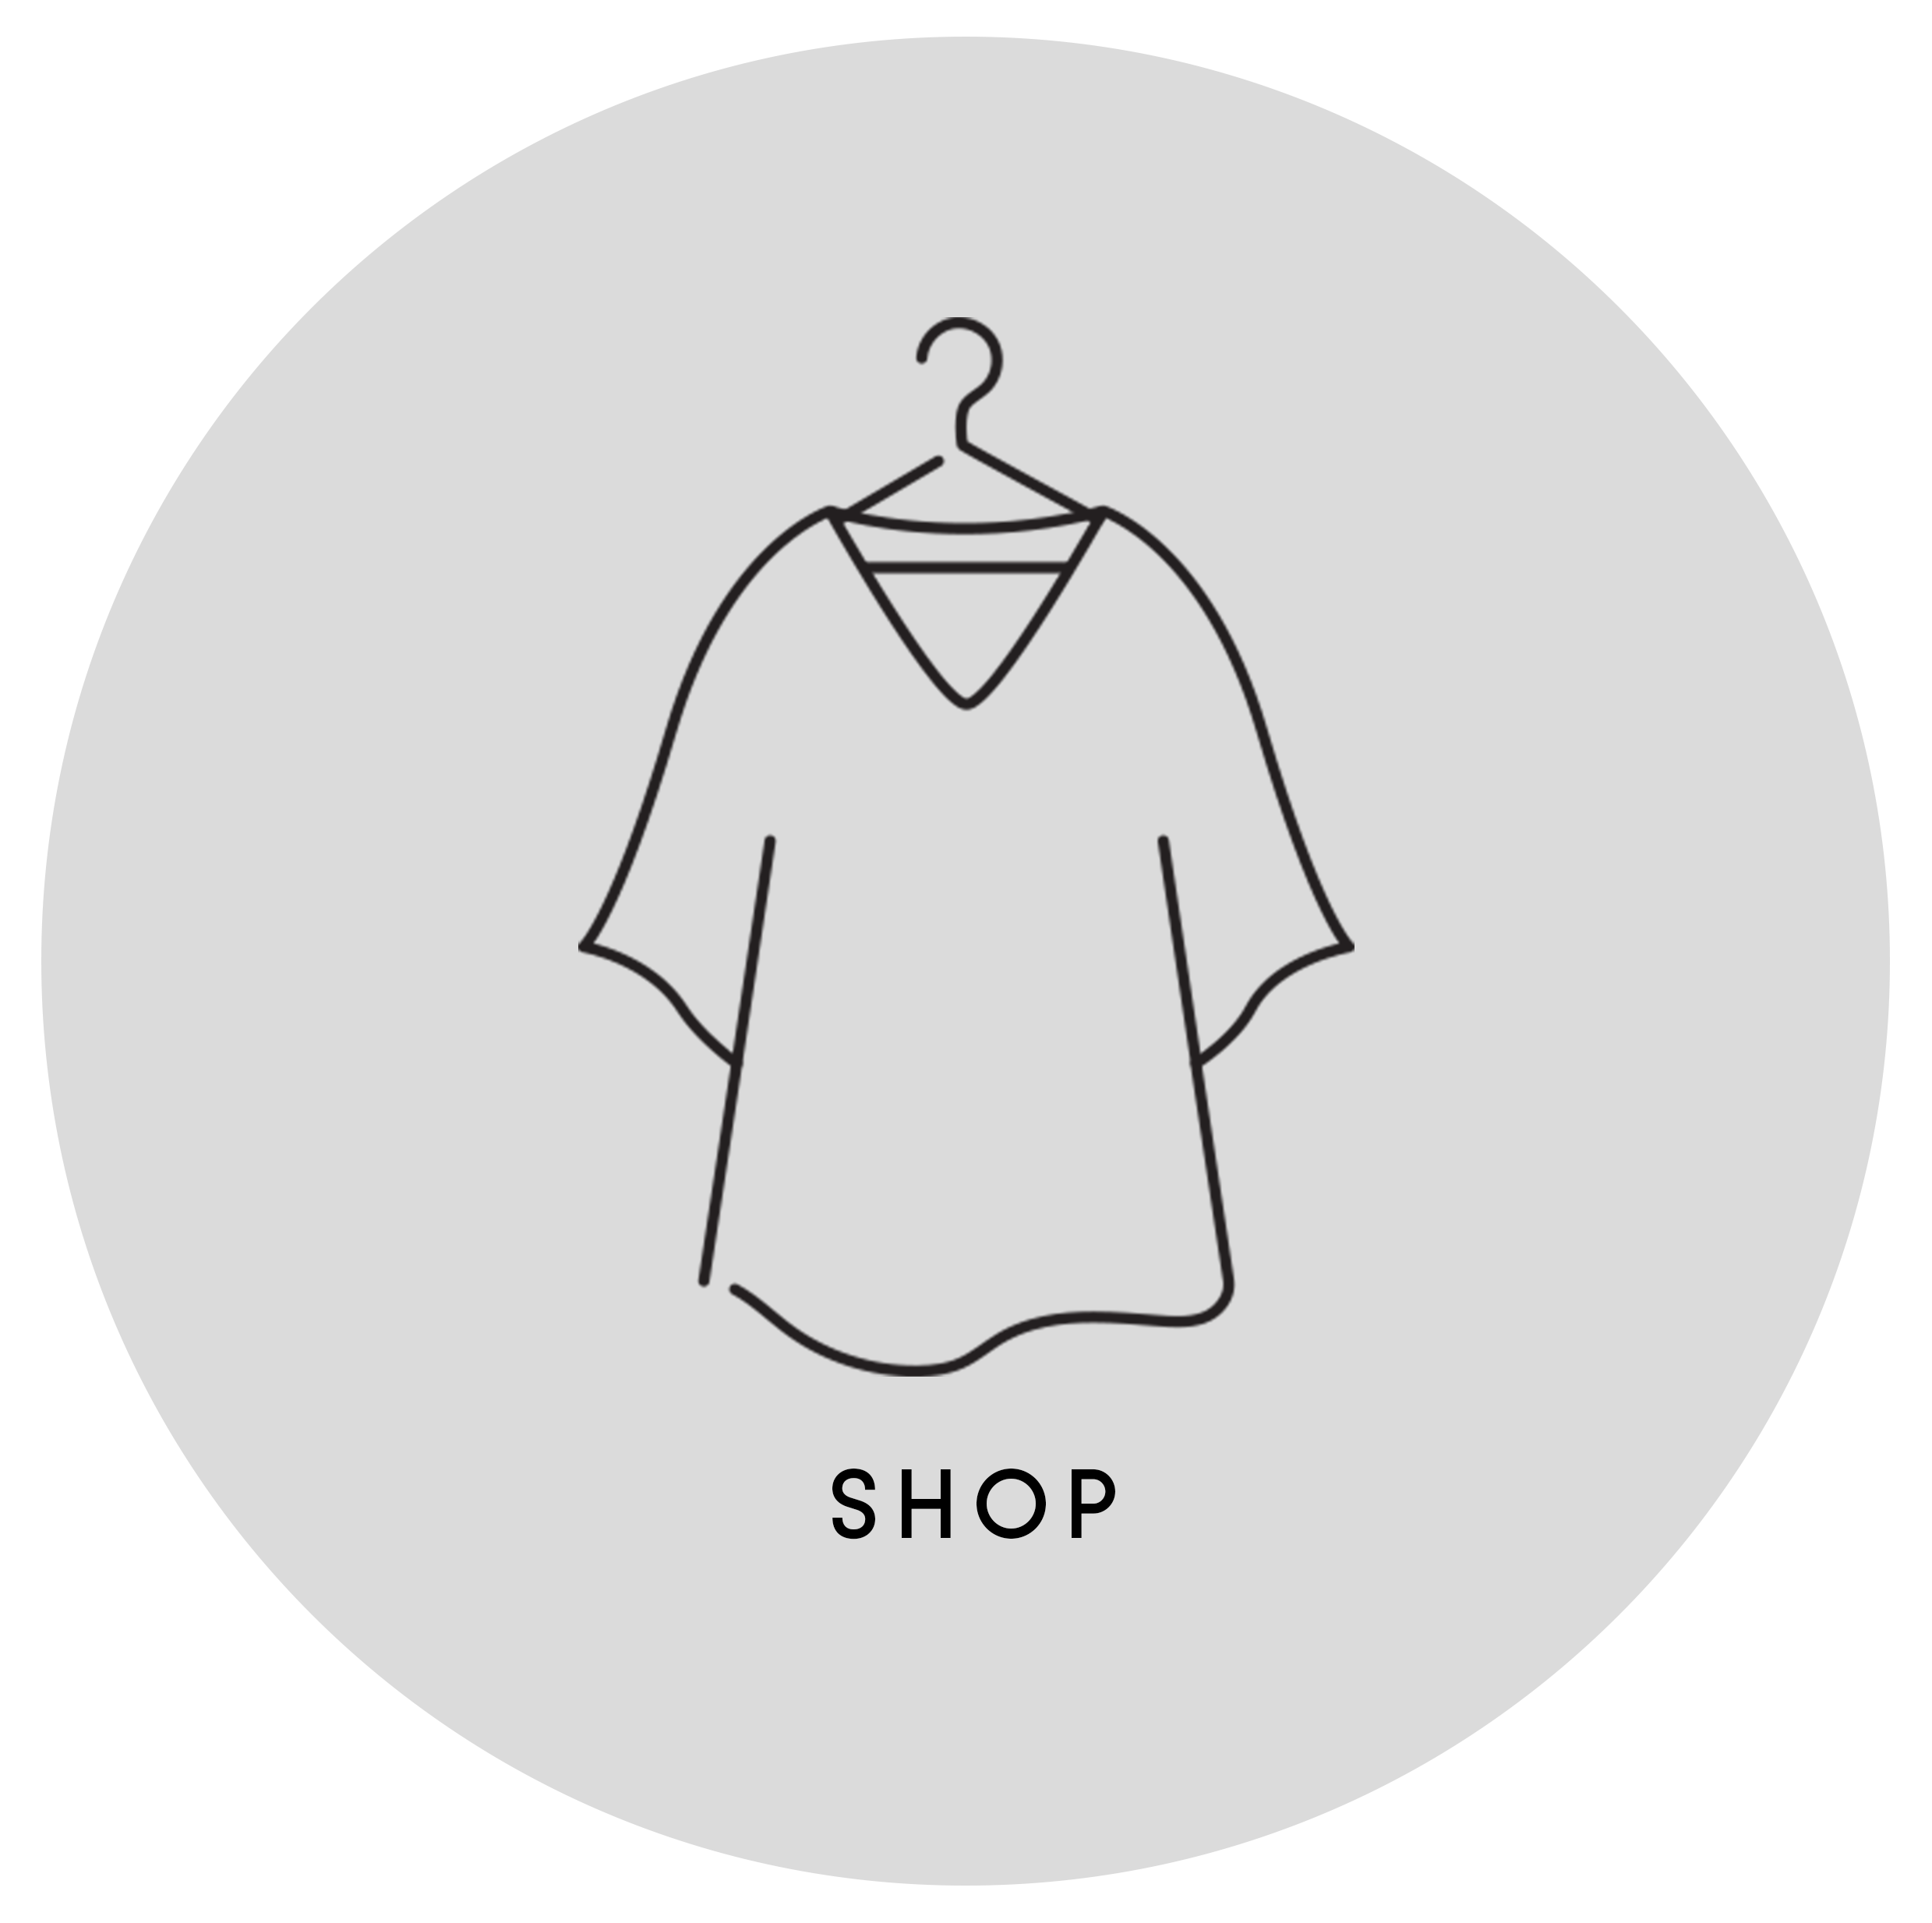 shop_circle2.png